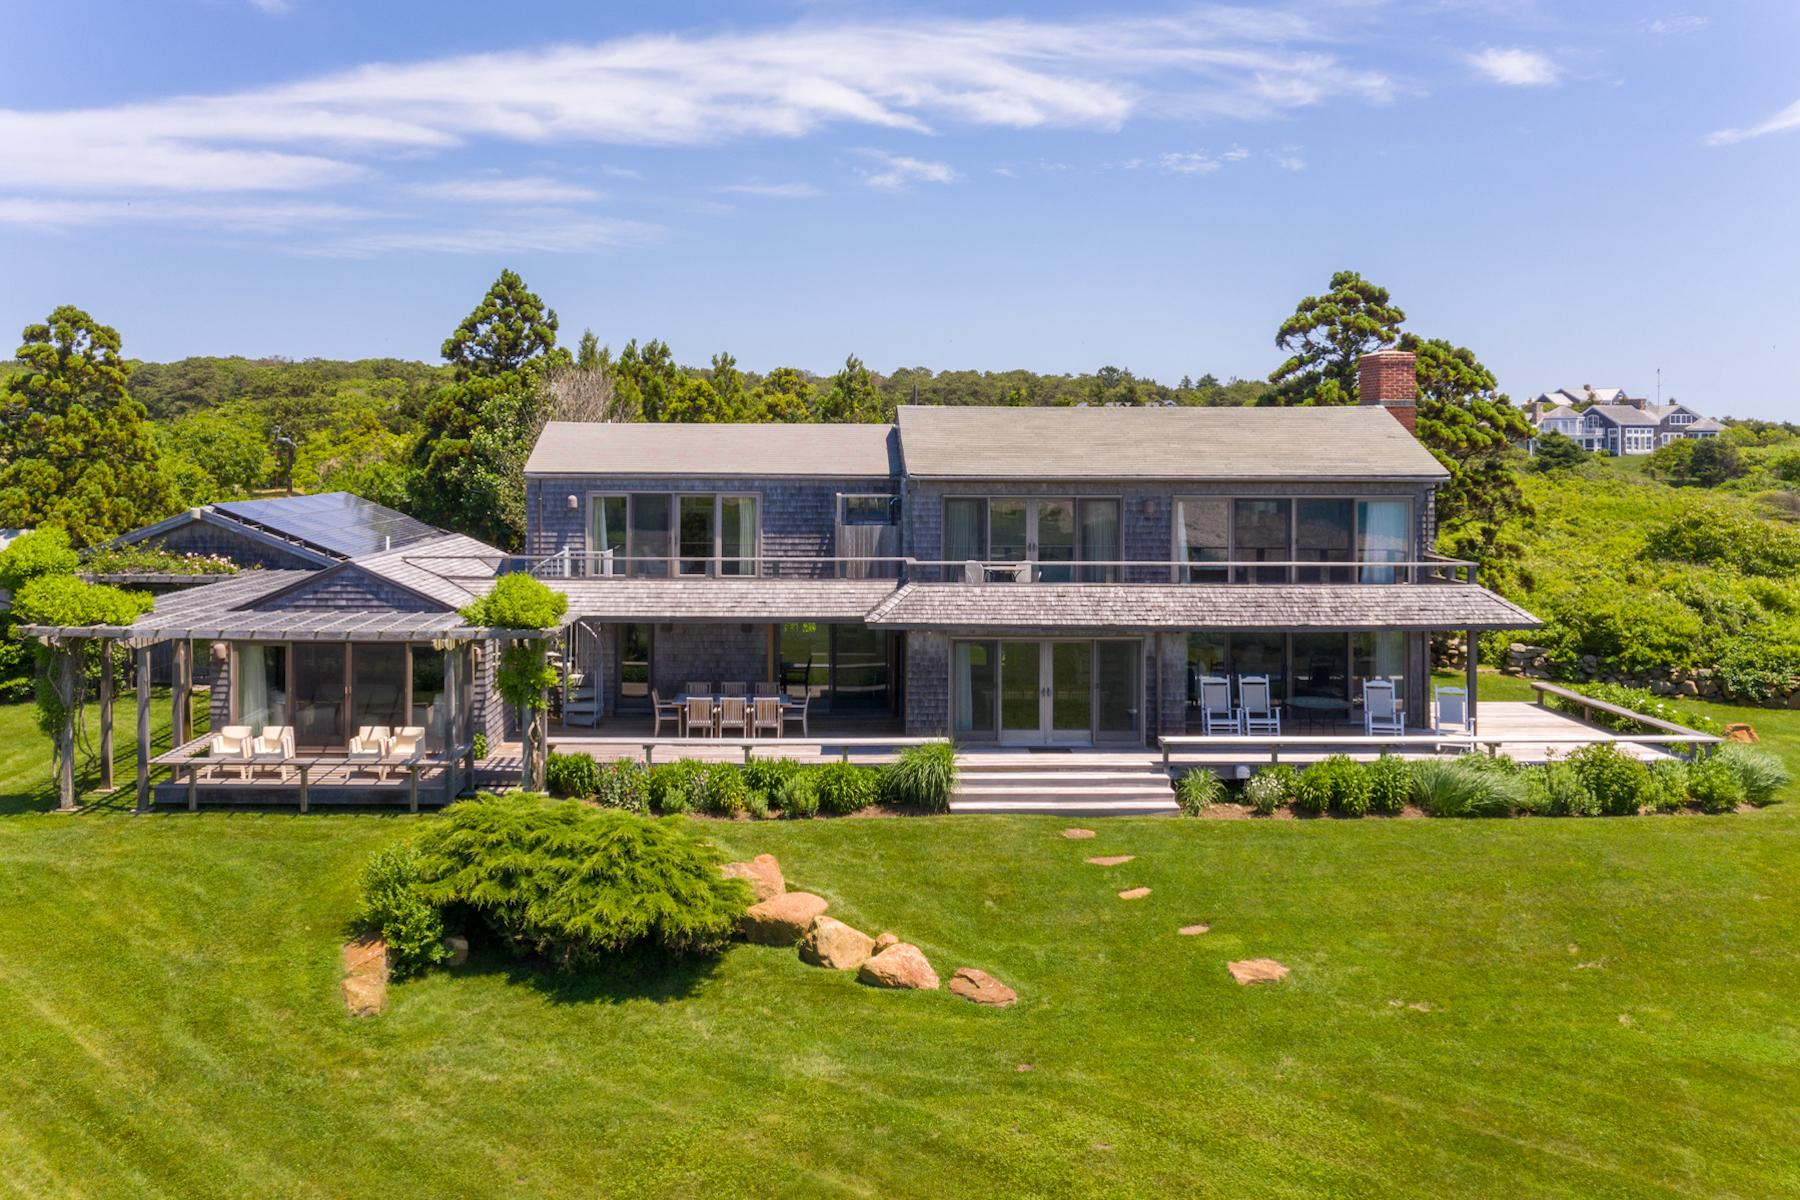 Single Family Homes for Active at Seaside Retreat on Martha's Vineyard 95 Stonewall Road Chilmark, Massachusetts 02535 United States